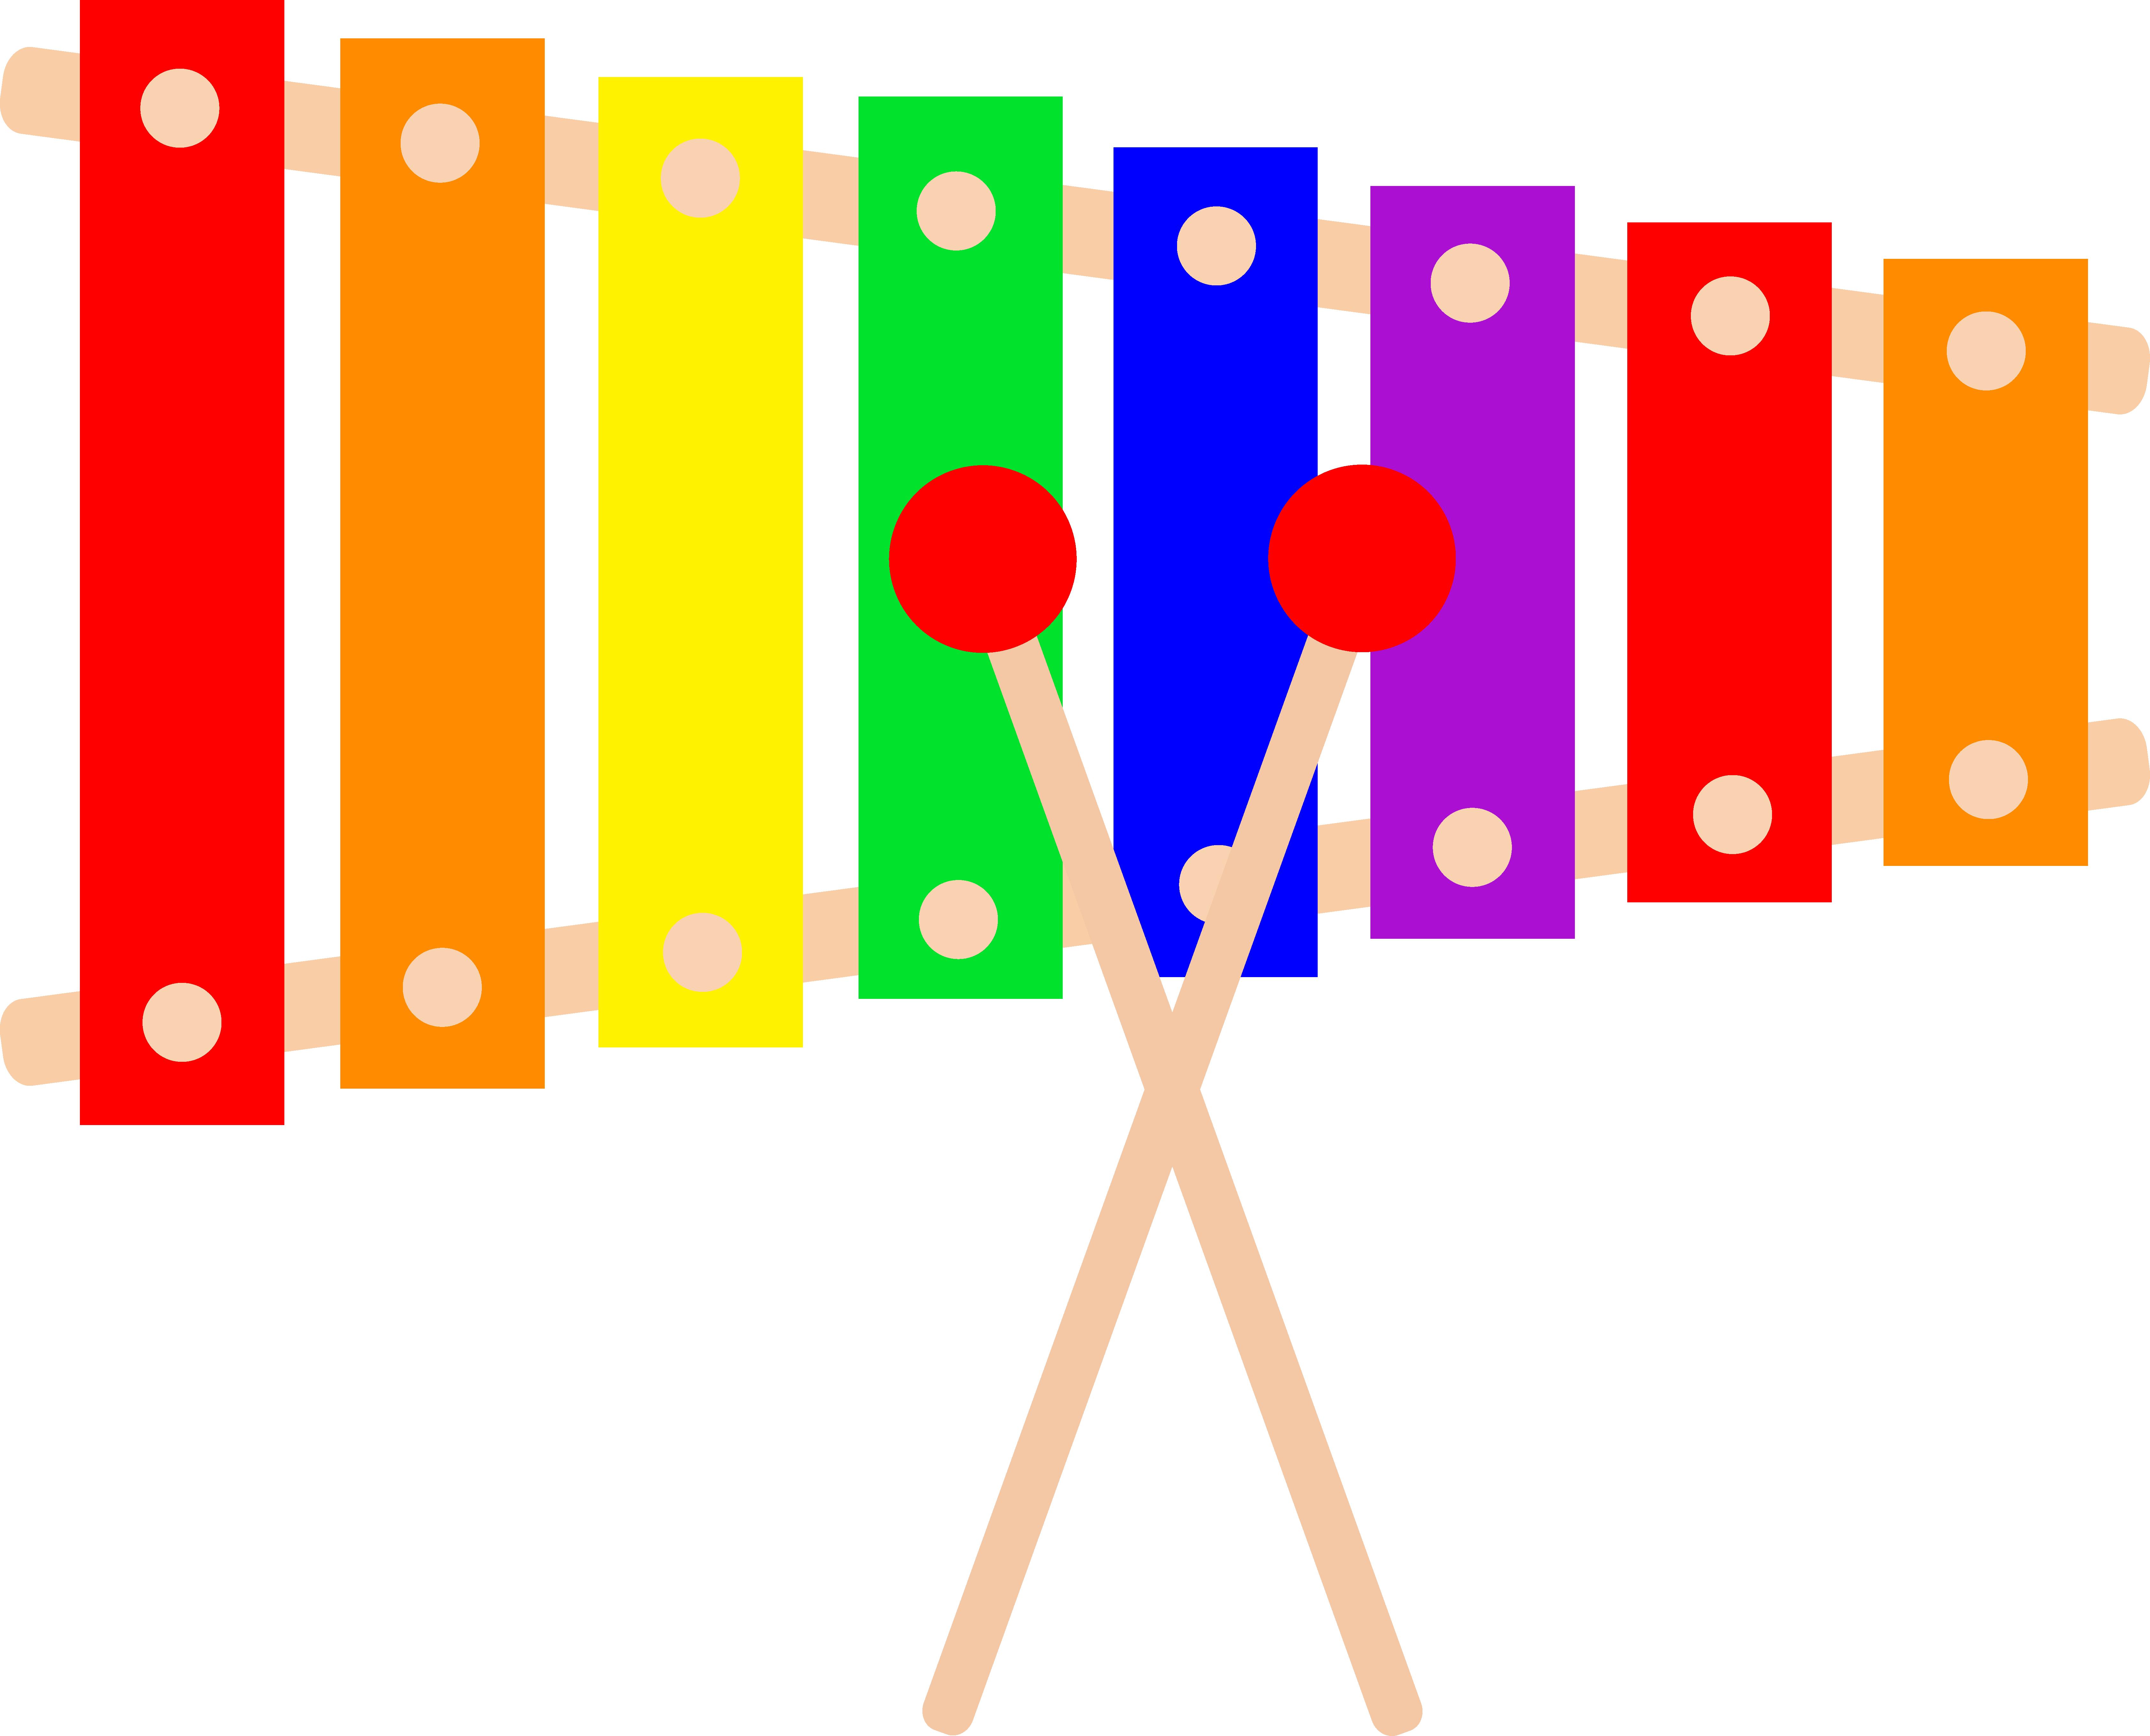 Xylophone clipart larawan. Preschool programs hills learning